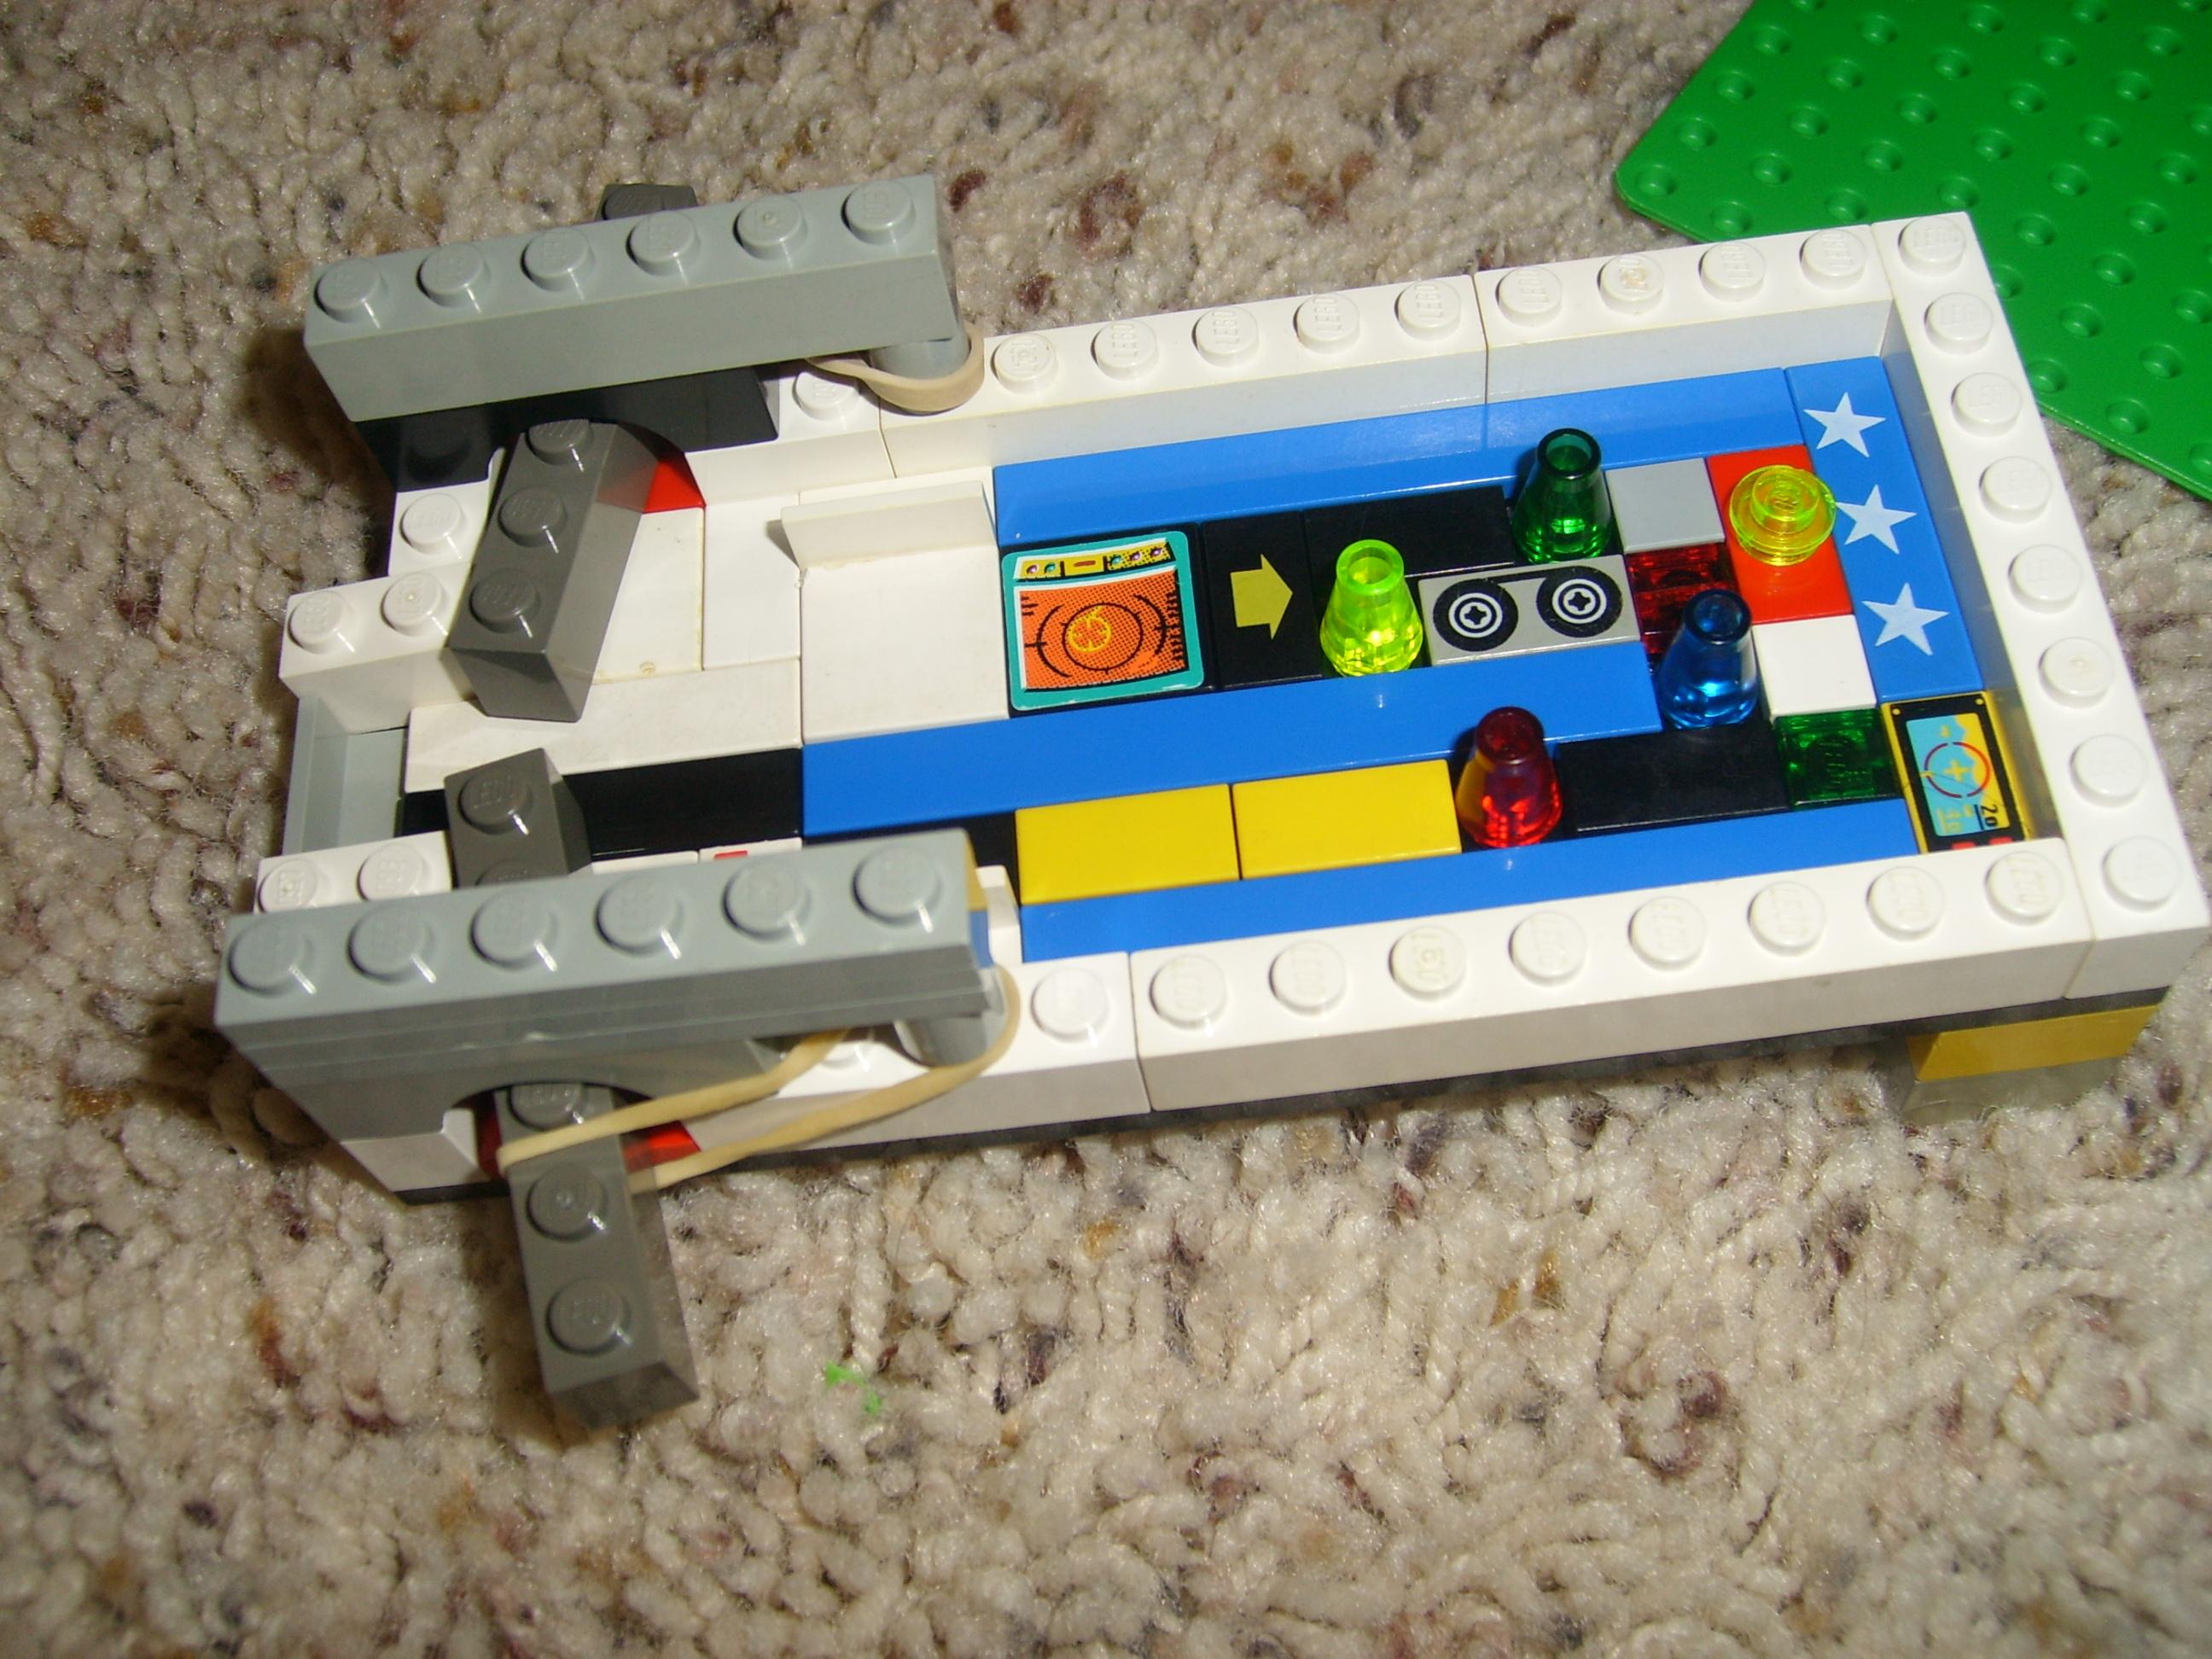 The Mini Lego Pinball Machine